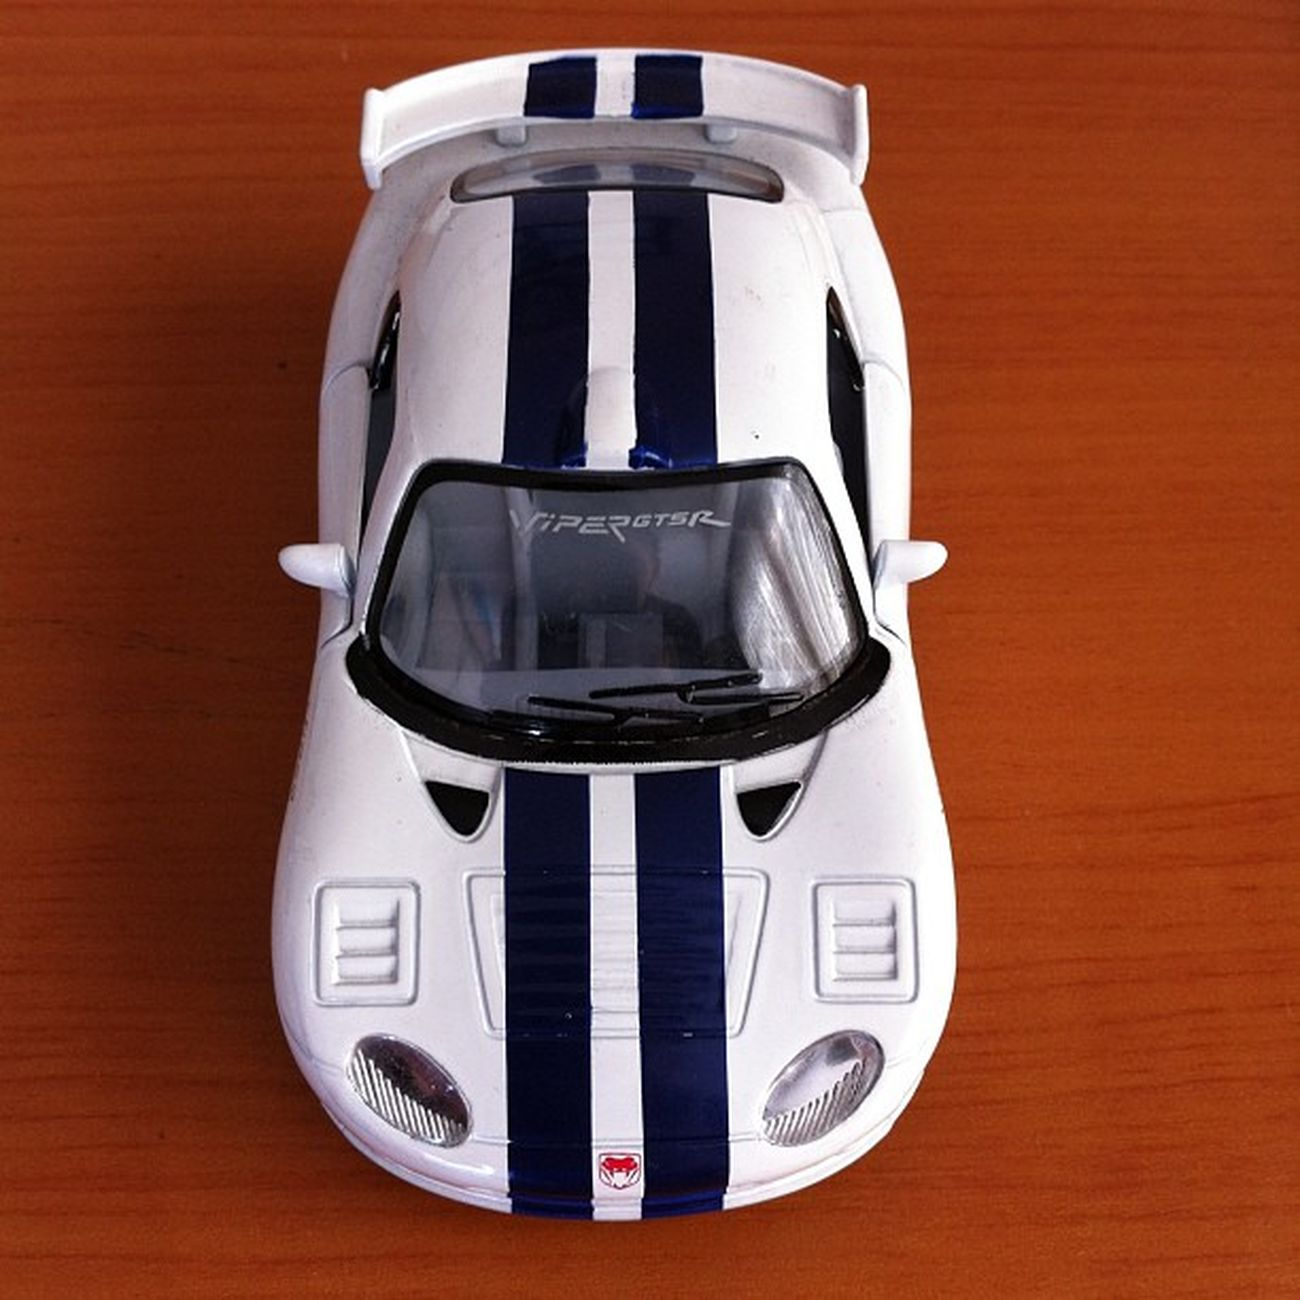 Maket Oto Otomobil Kolleksiyon araba viper